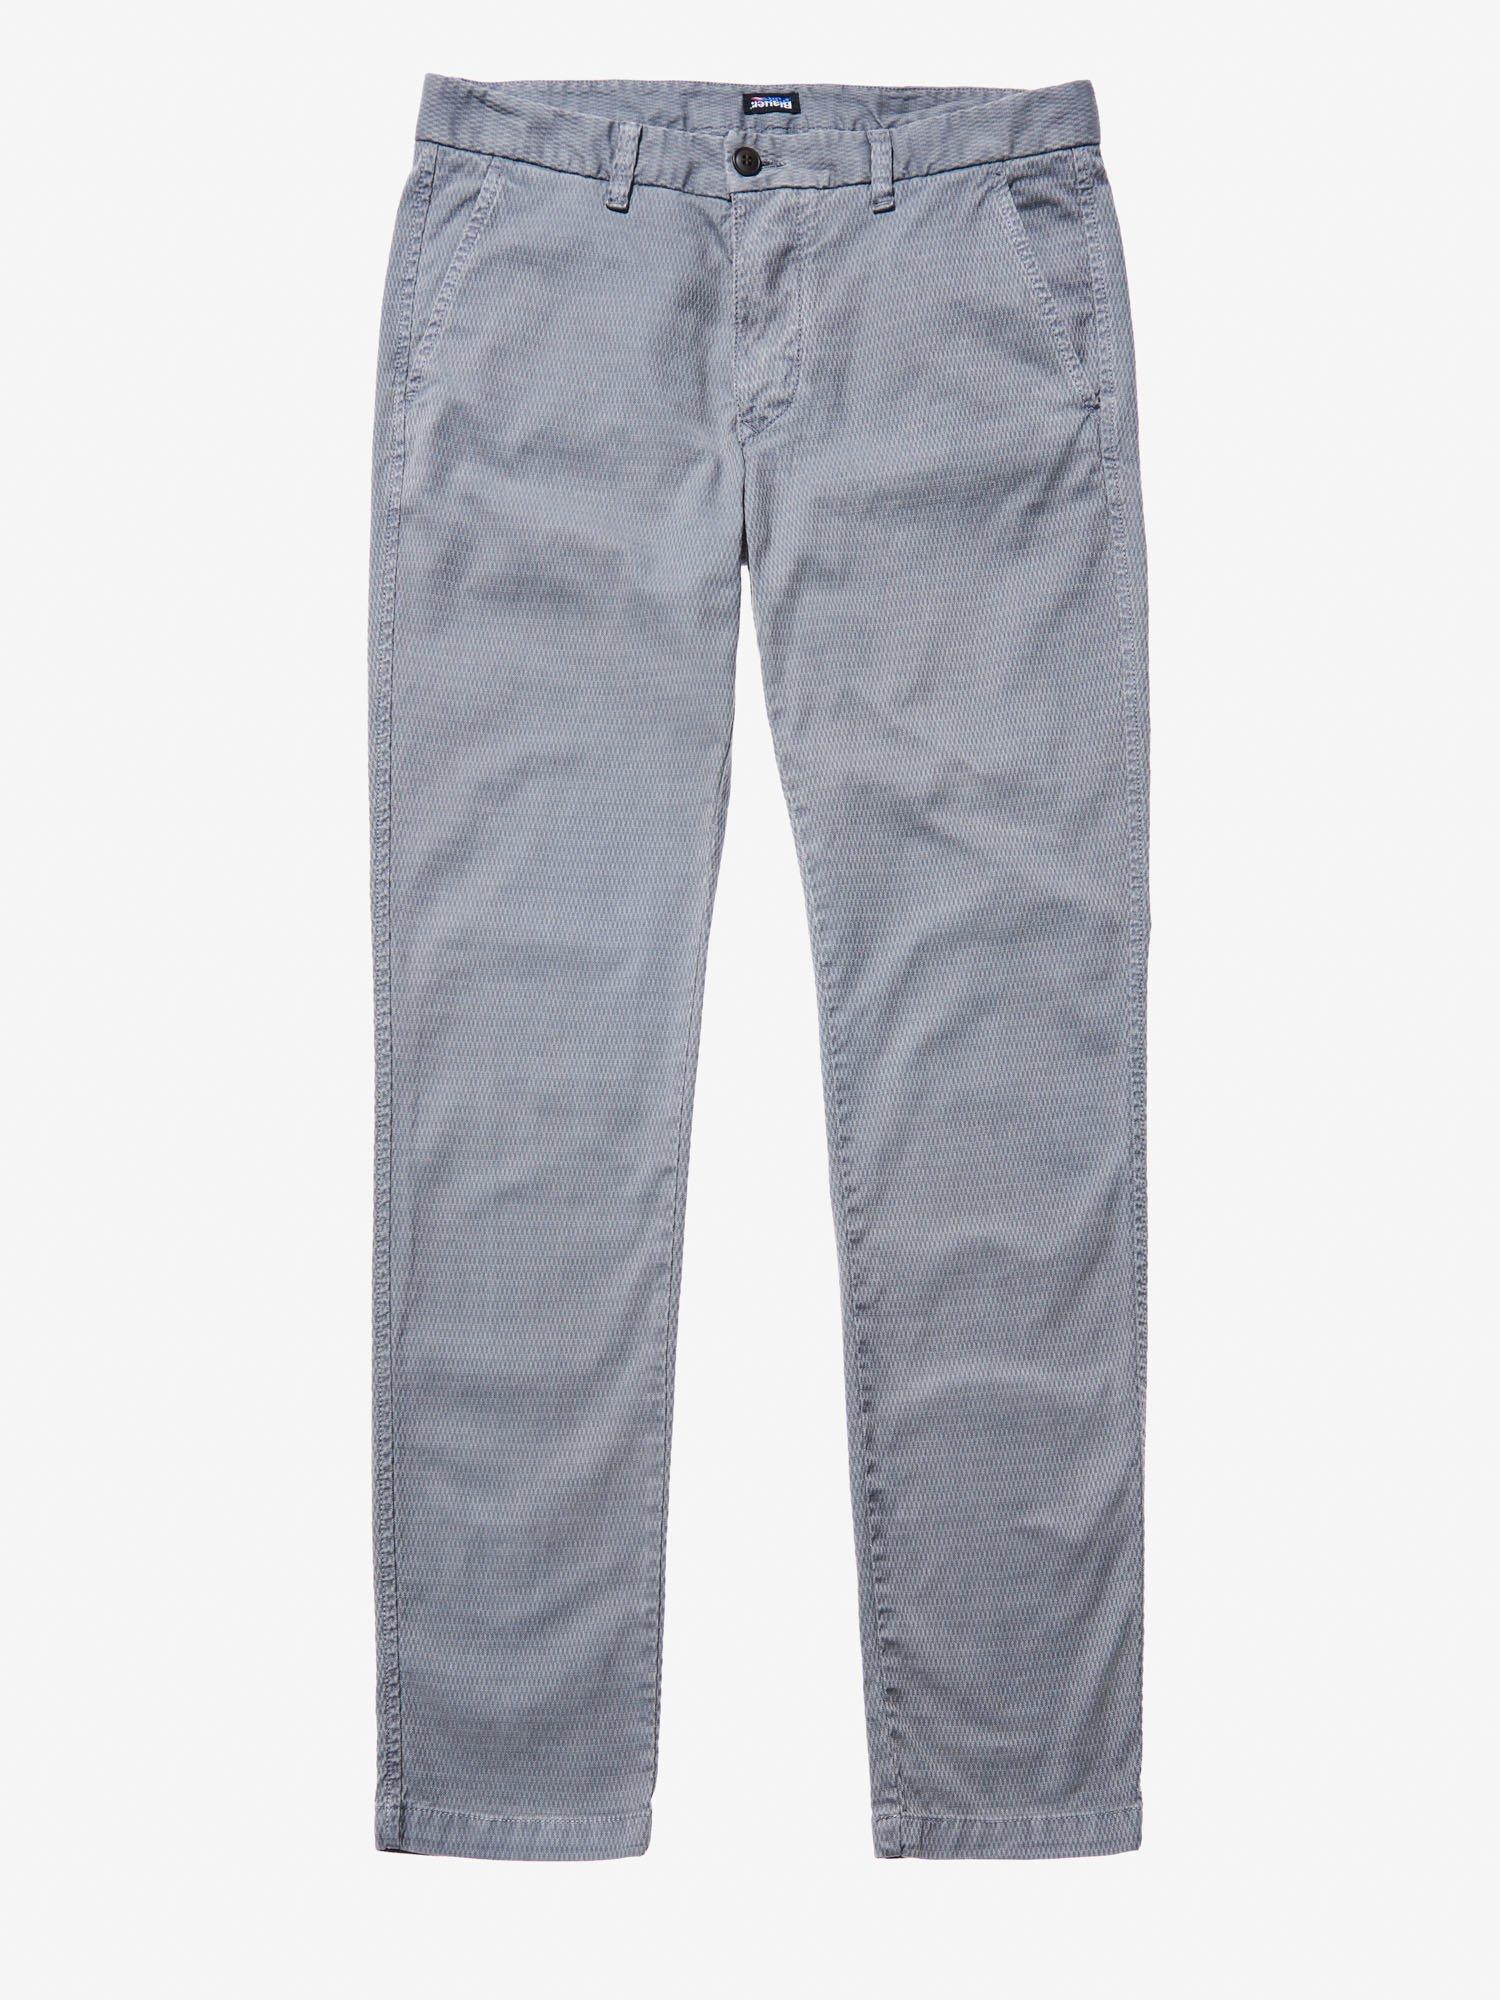 JACQUARD CHINO PANTS - Blauer